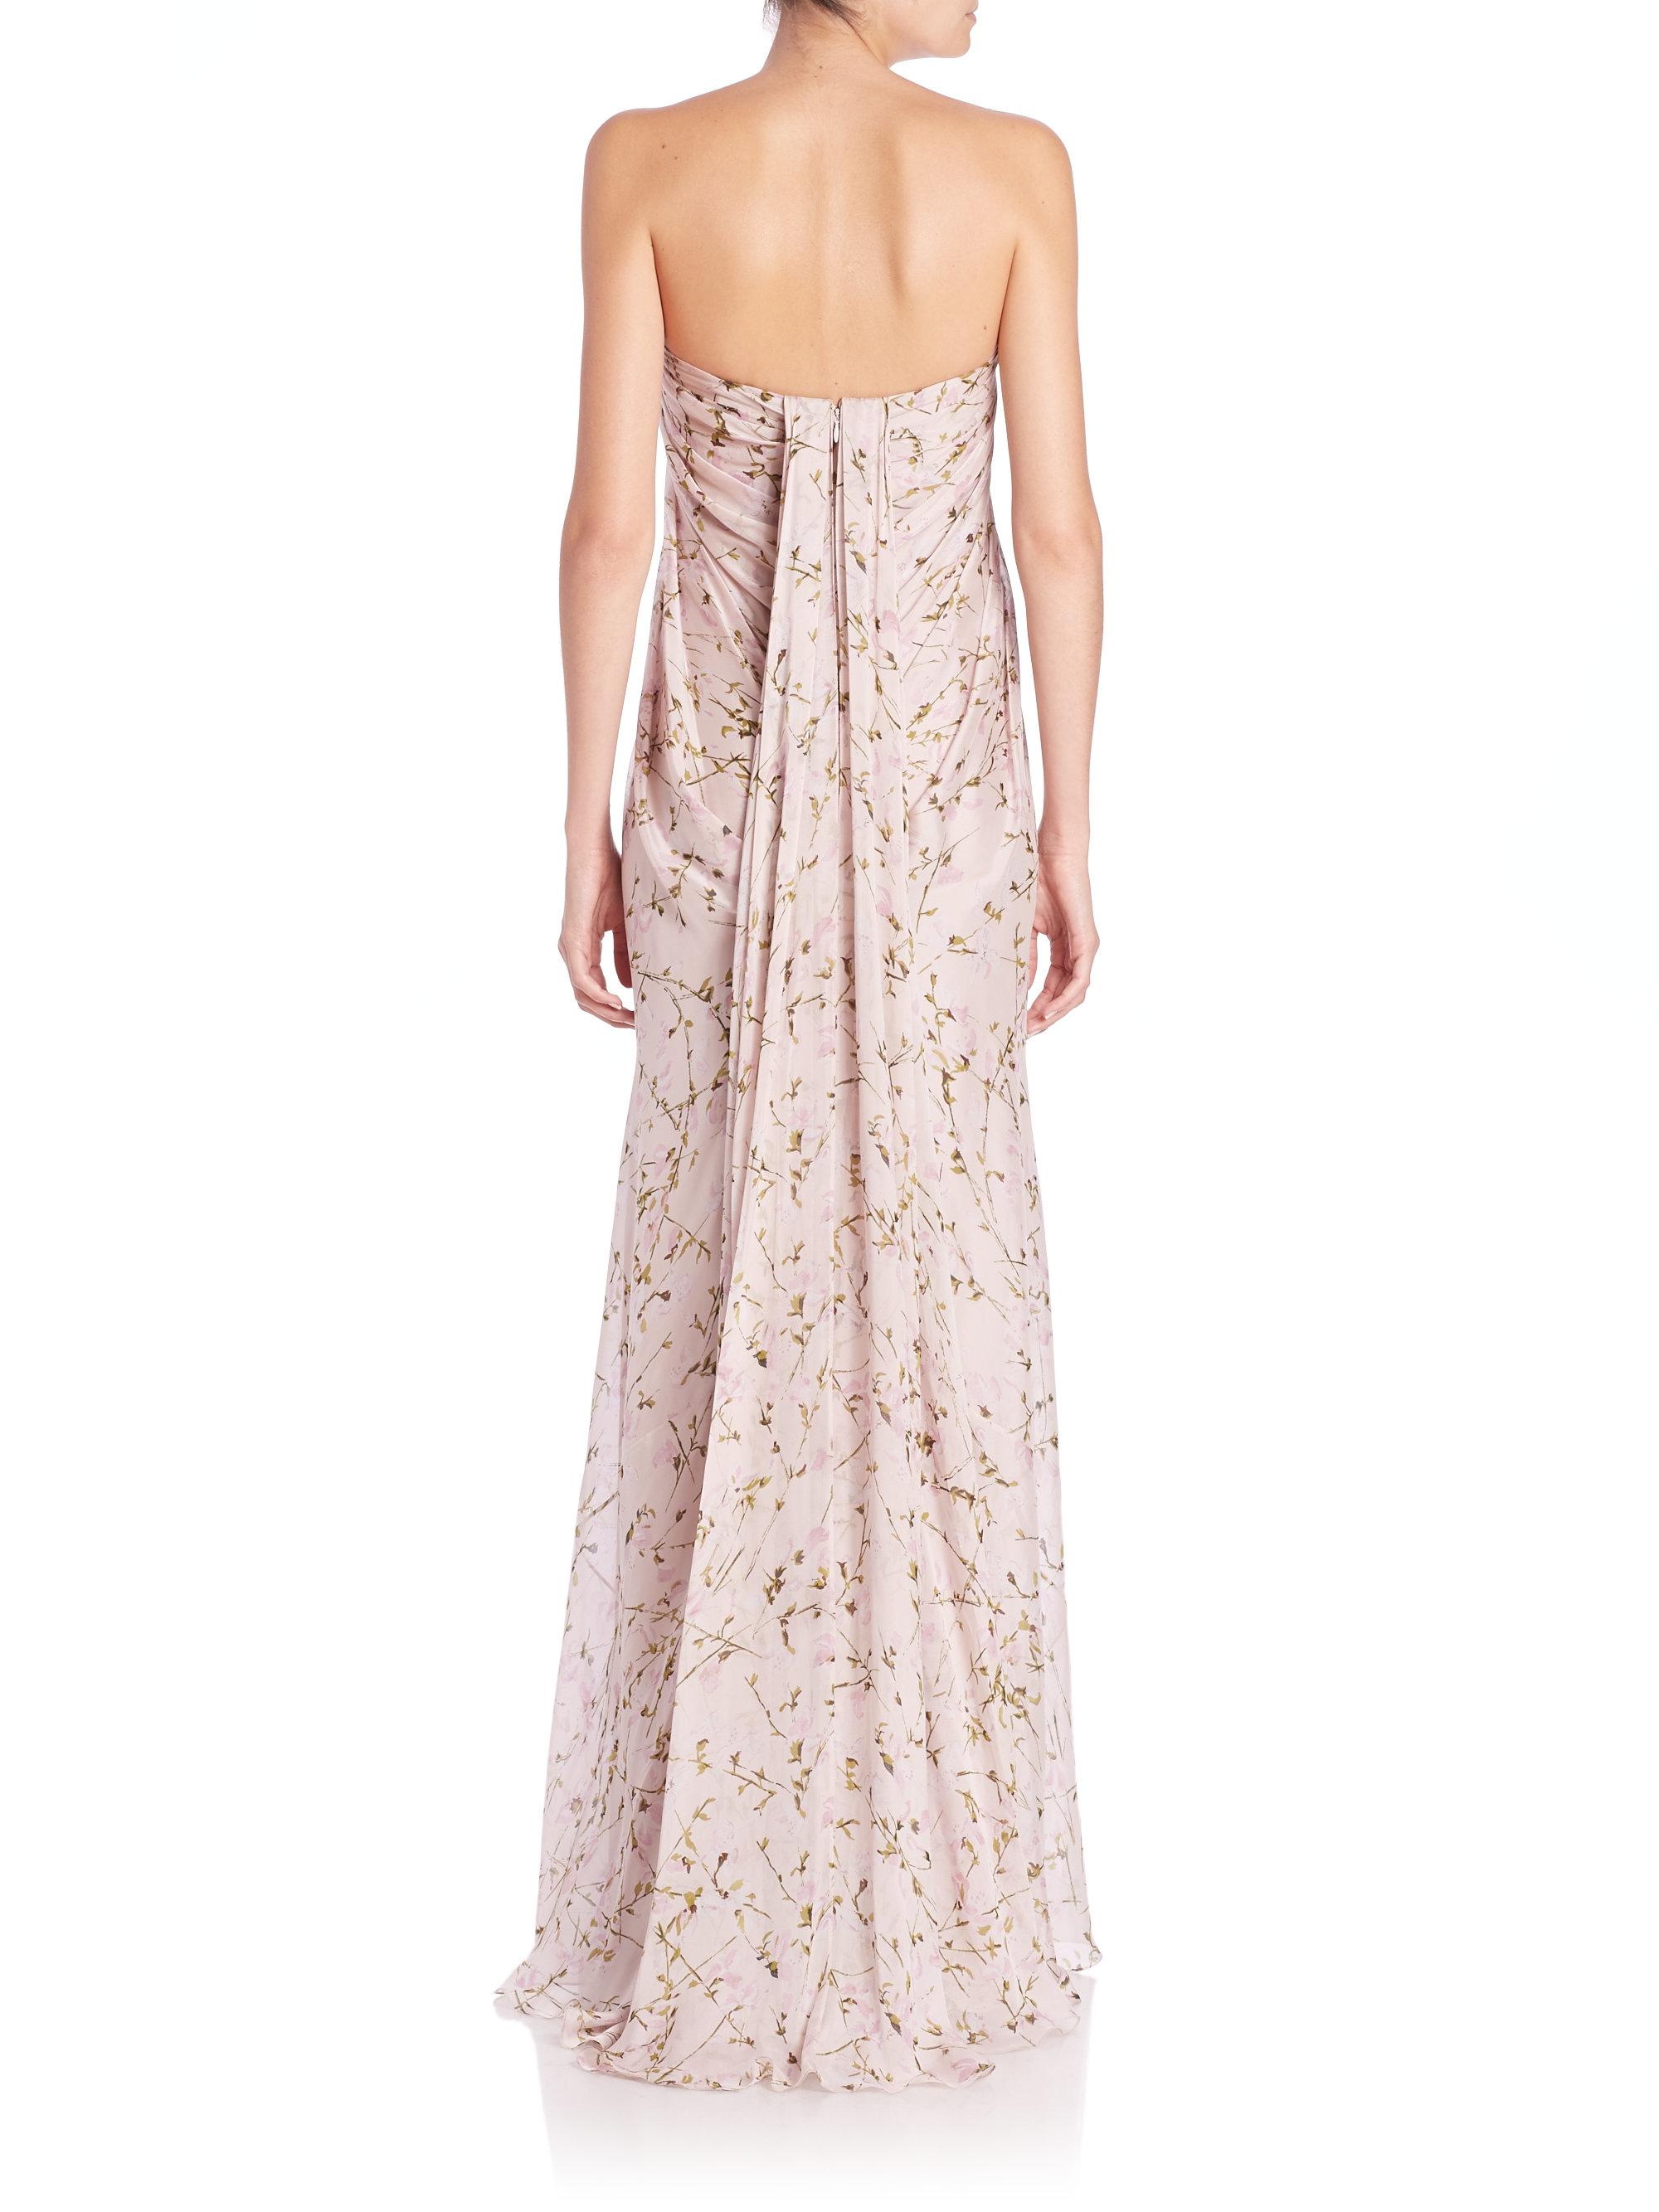 Lyst - Alexander Mcqueen Strapless Silk Chiffon Sweetpea Gown in Pink